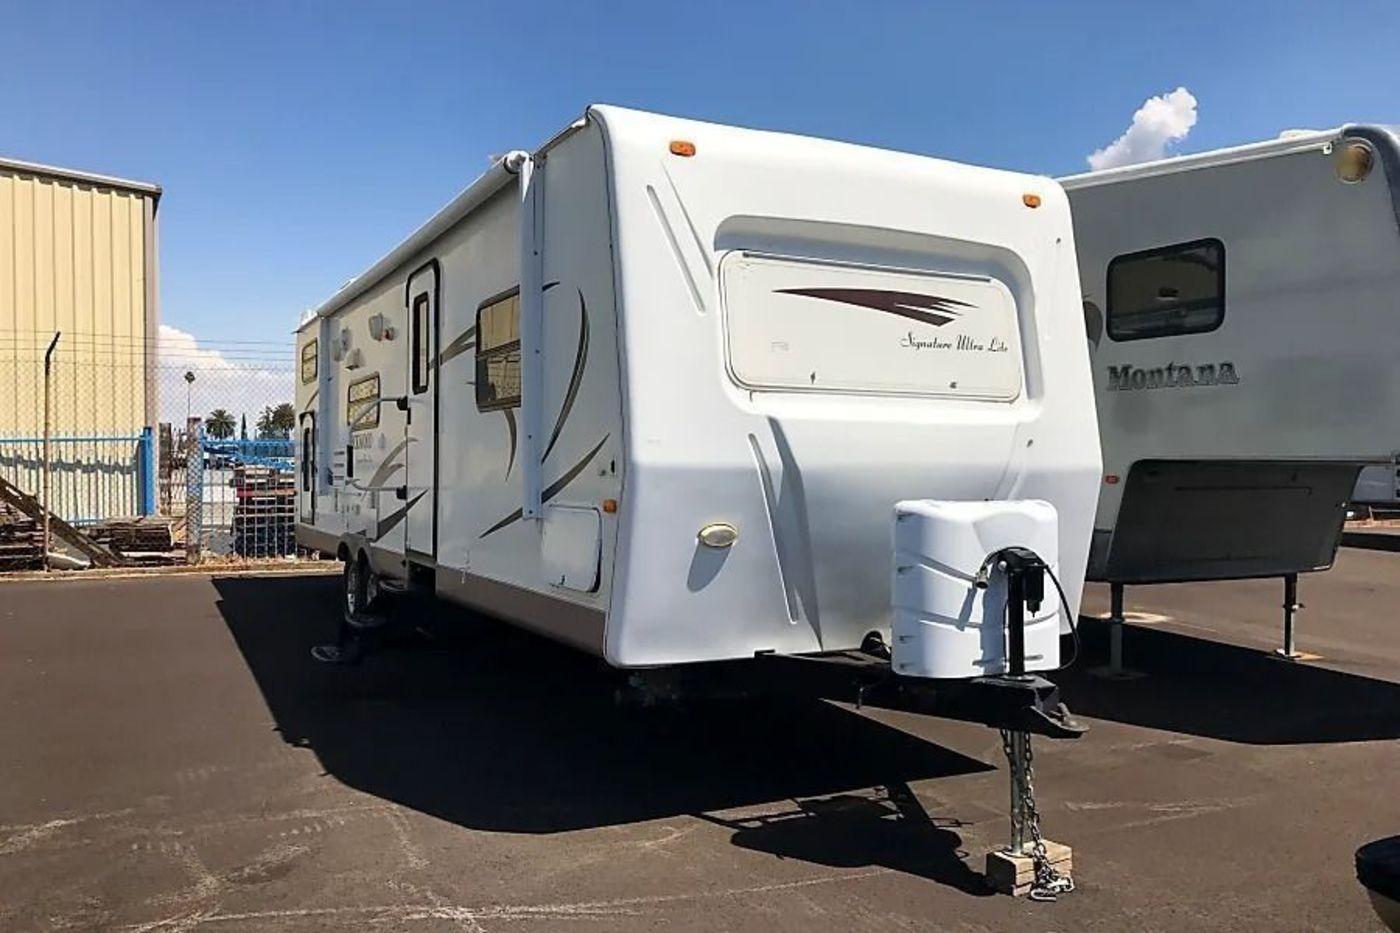 2010 Fleetwood RV Tioga Ranger 31N, RV Rental in South El